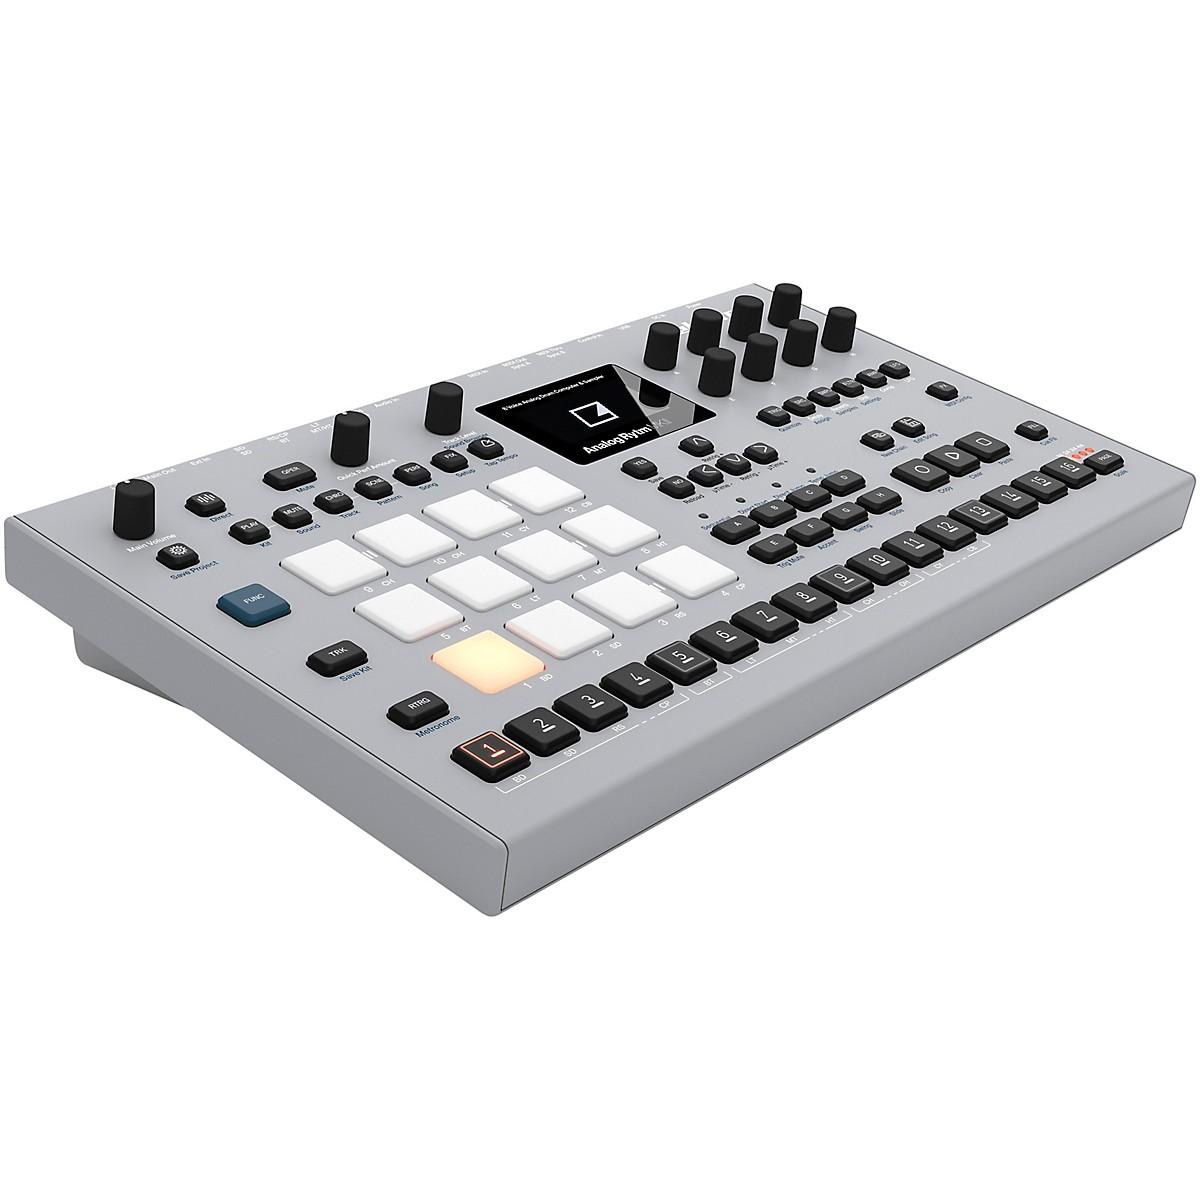 Elektron Analog Rytm MKII 8-Voice Drum Machine